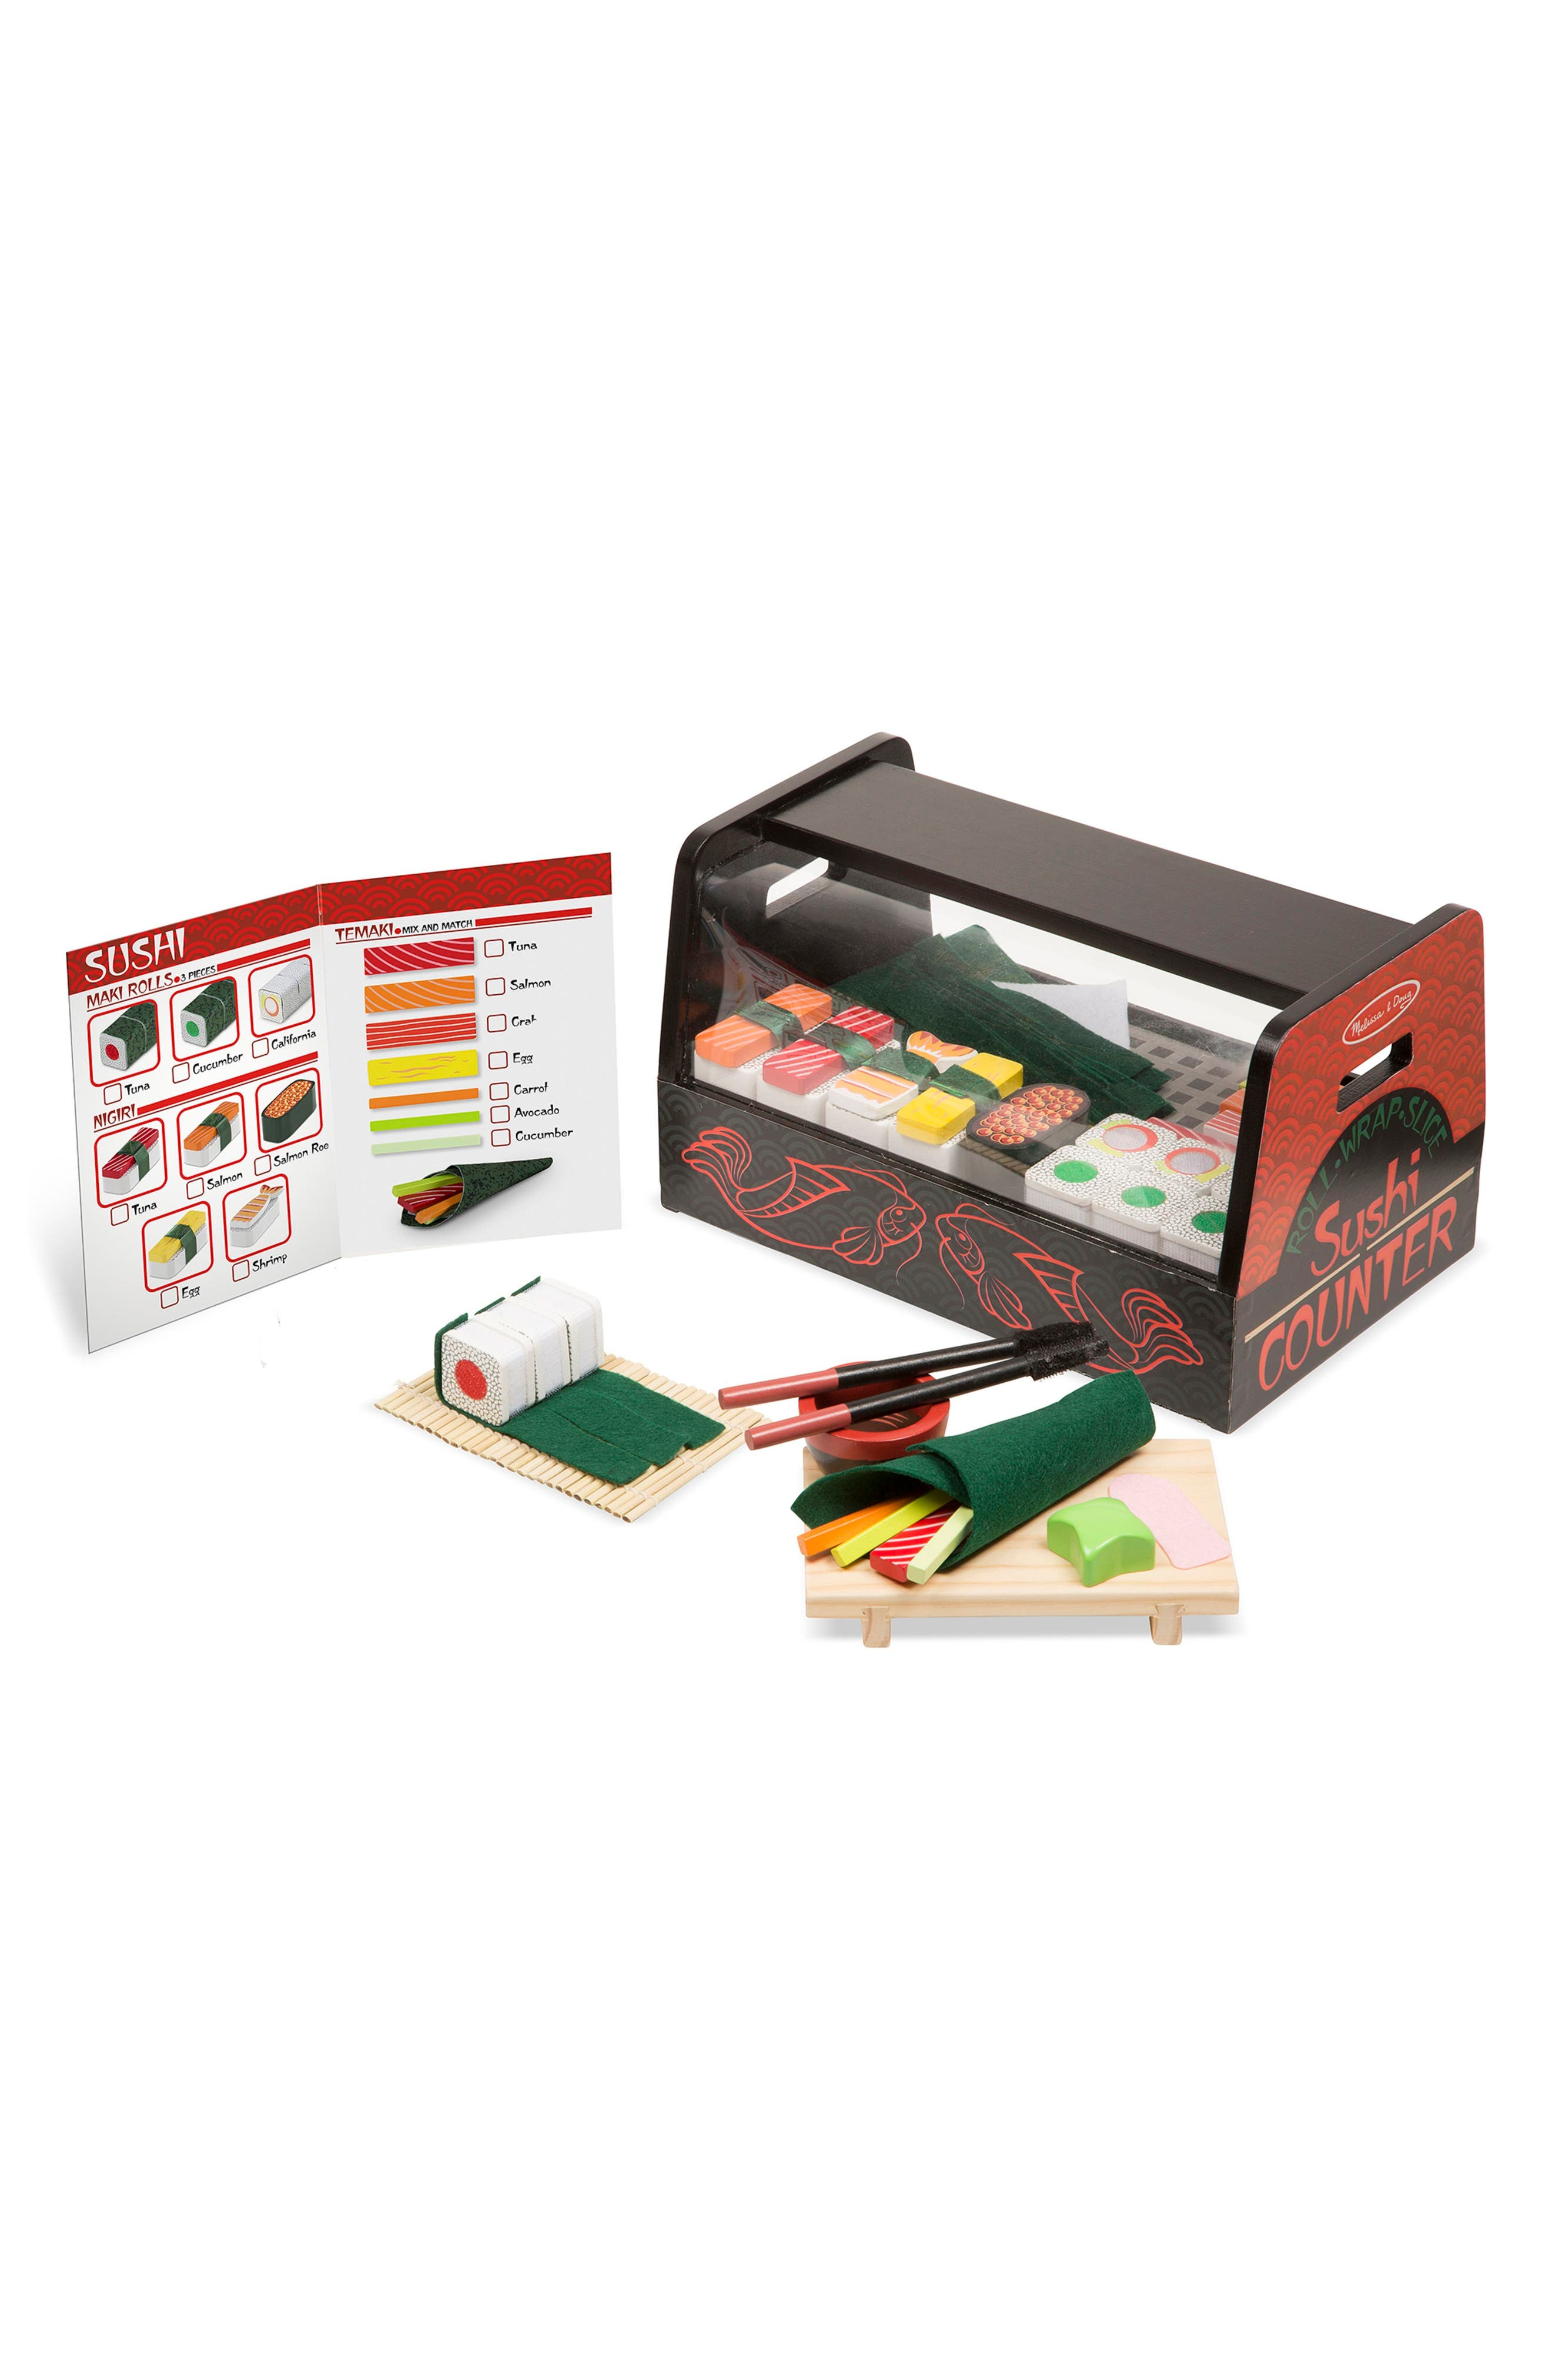 Main Image - Melissa & Doug 46-Piece Roll Wrap Slice Sushi Making Play Set